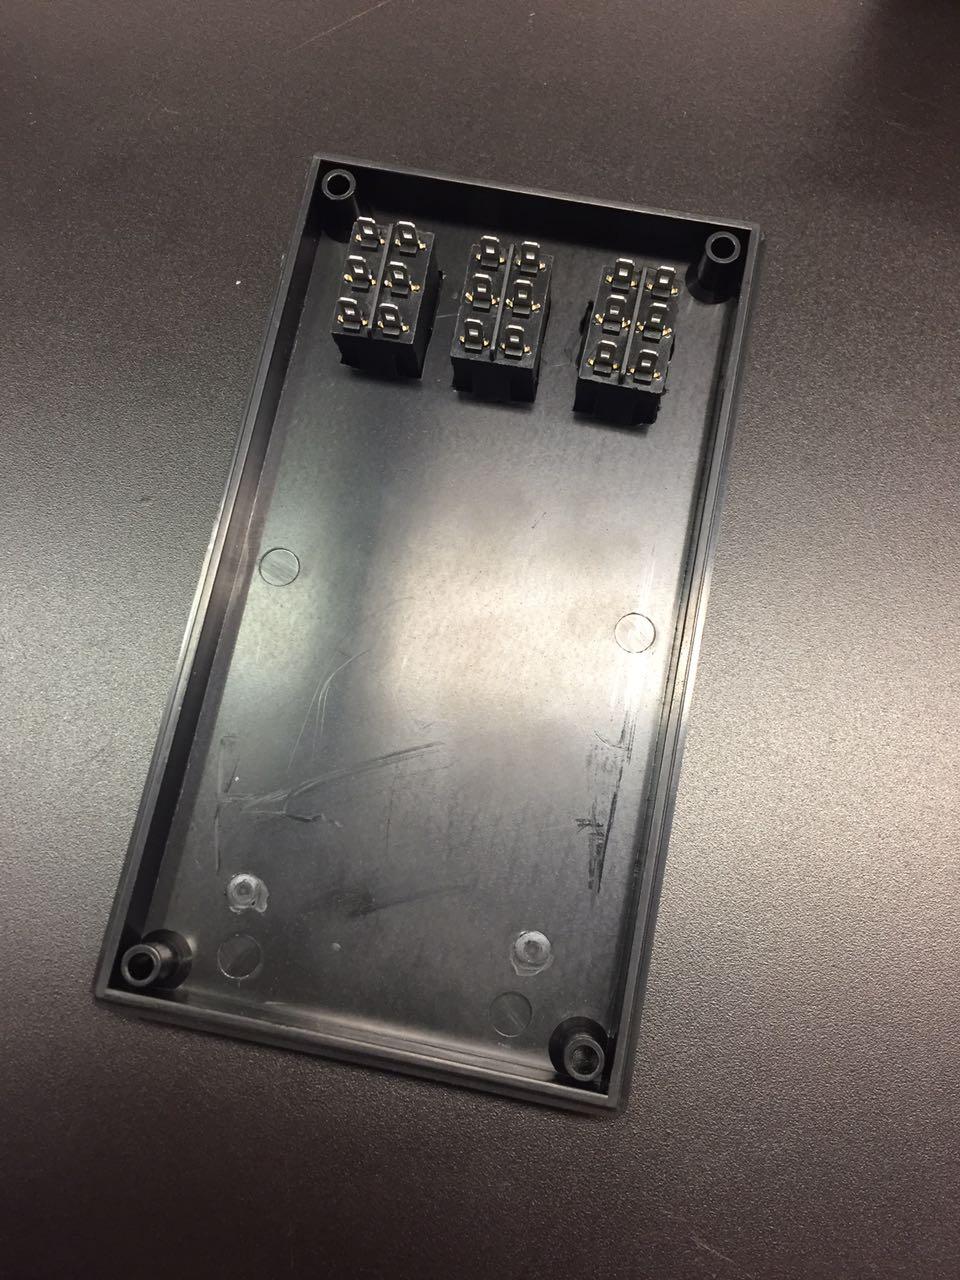 Cut the Control Box